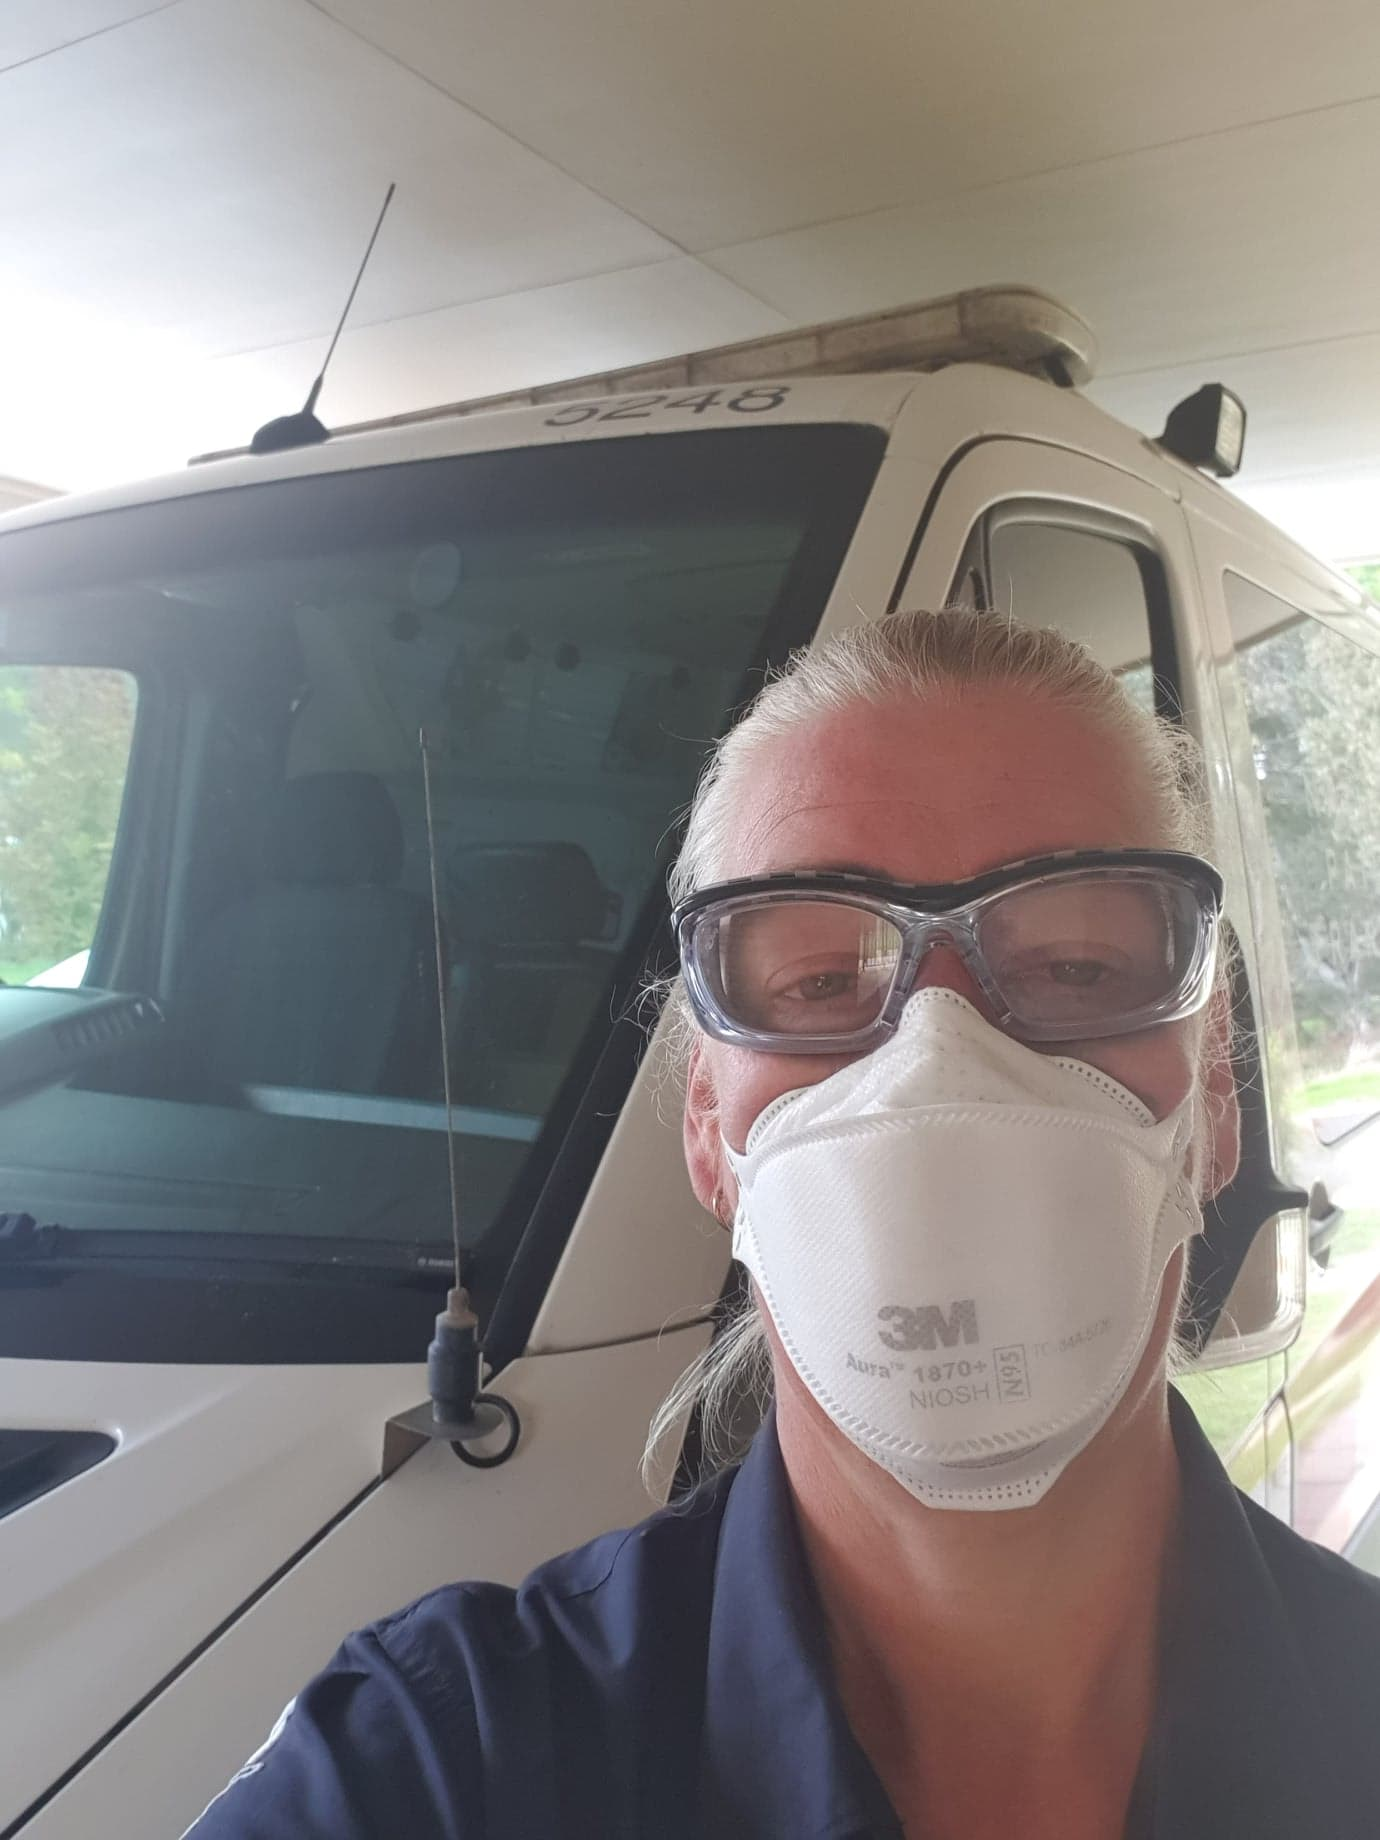 Onguard 220FS Leader Full Seal Safety Glasses